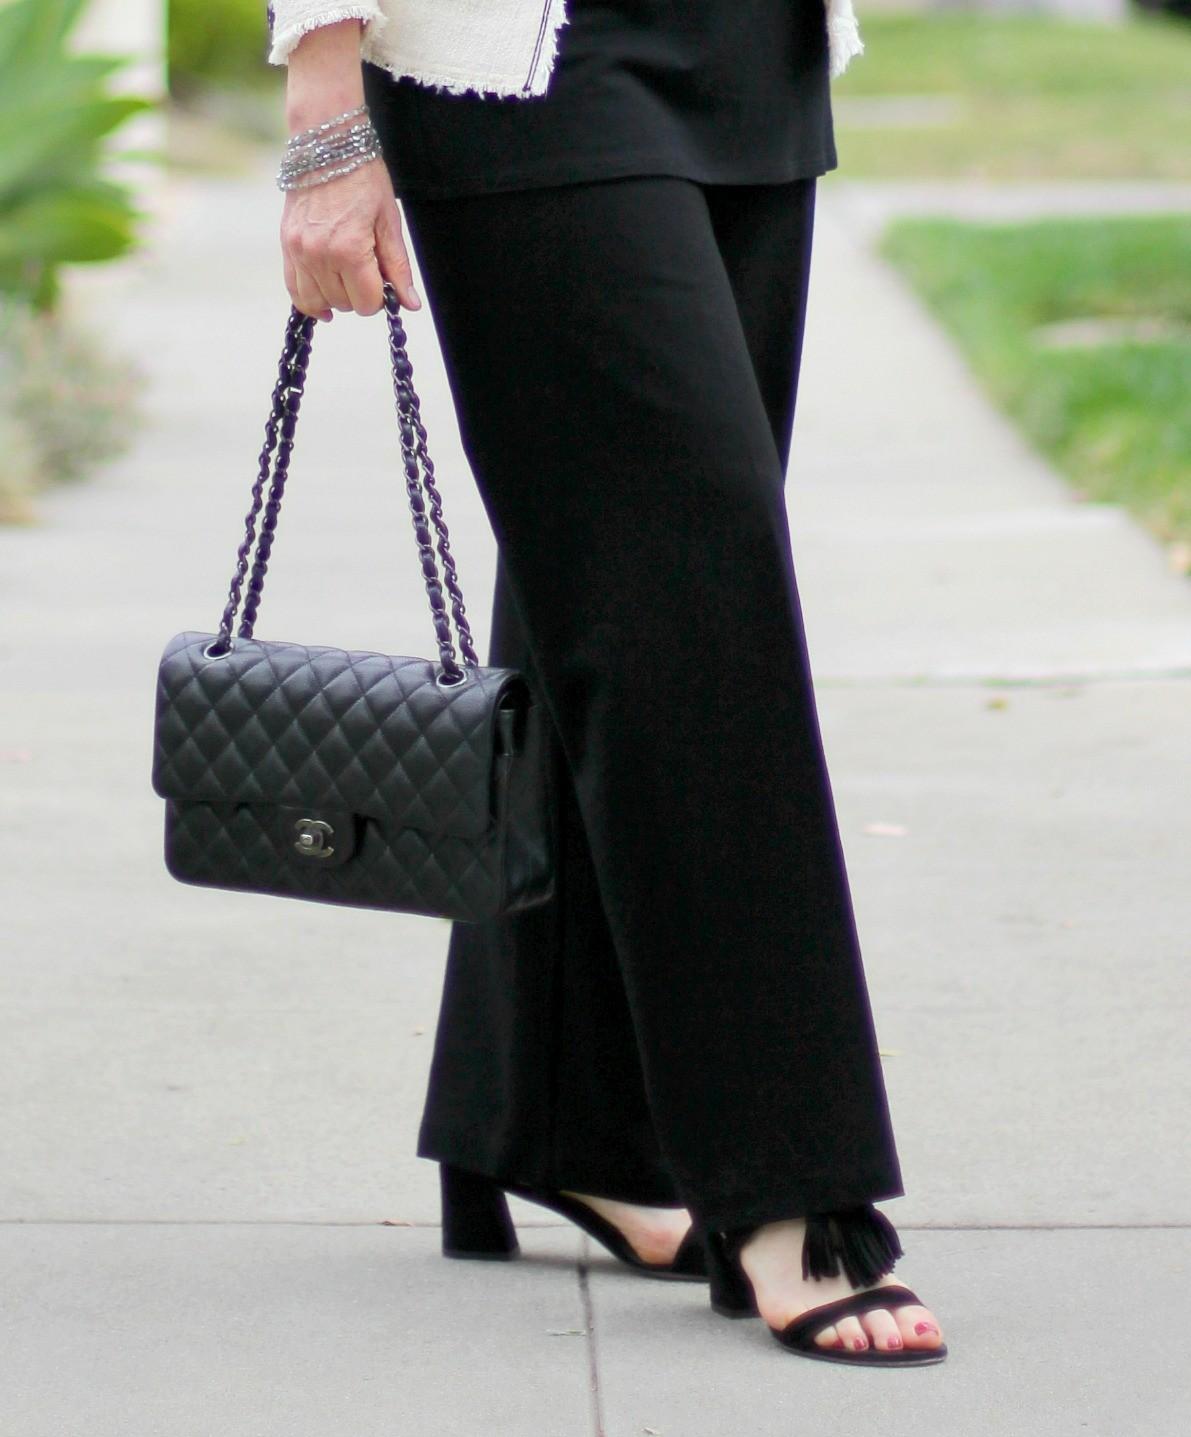 Chanel caviar flap, tassel suede block heel sandals